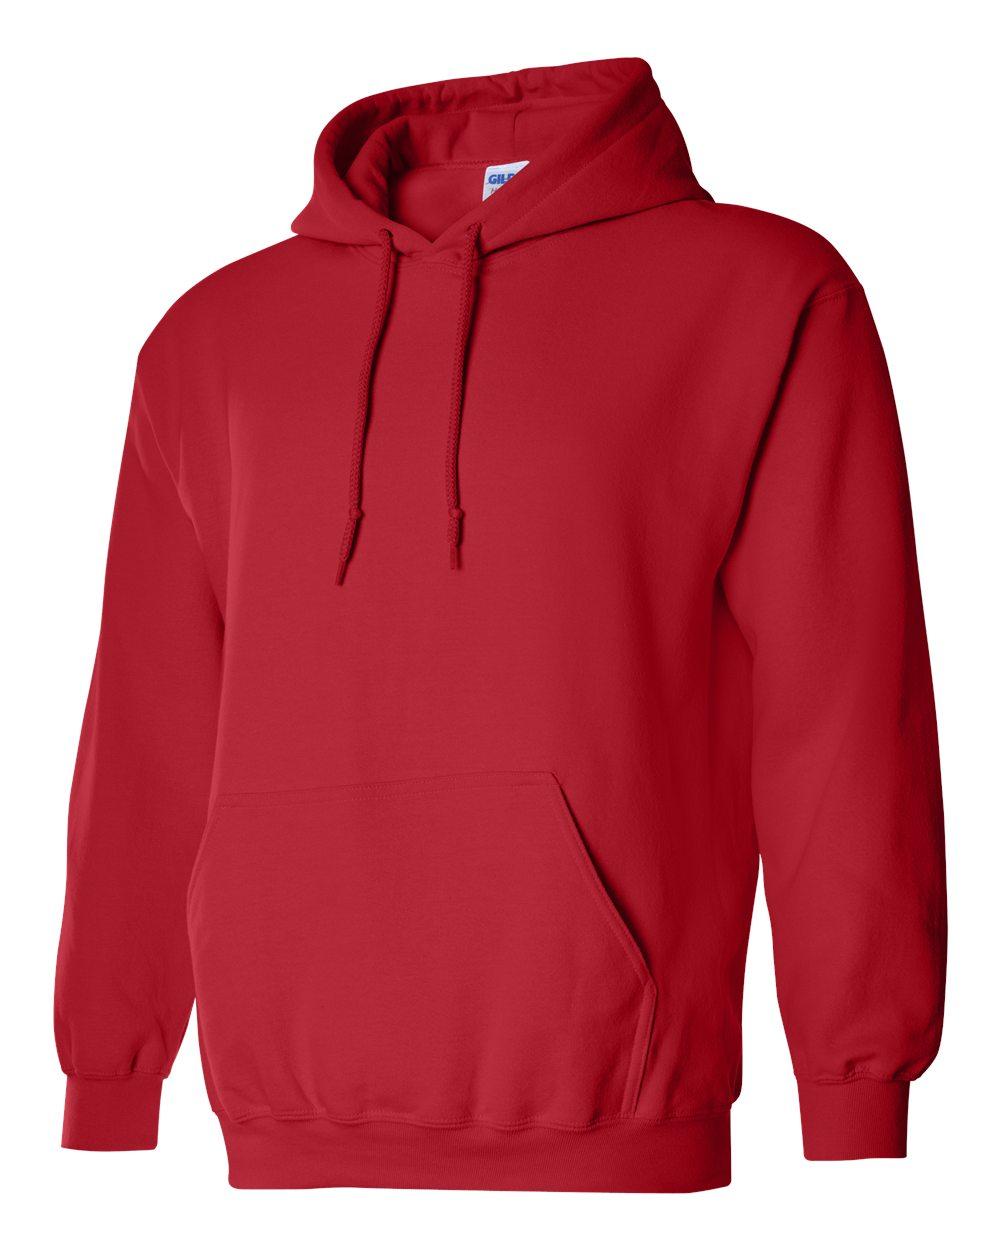 Gildan Heavy Blend Hooded Sweatshirt GI18500 Red